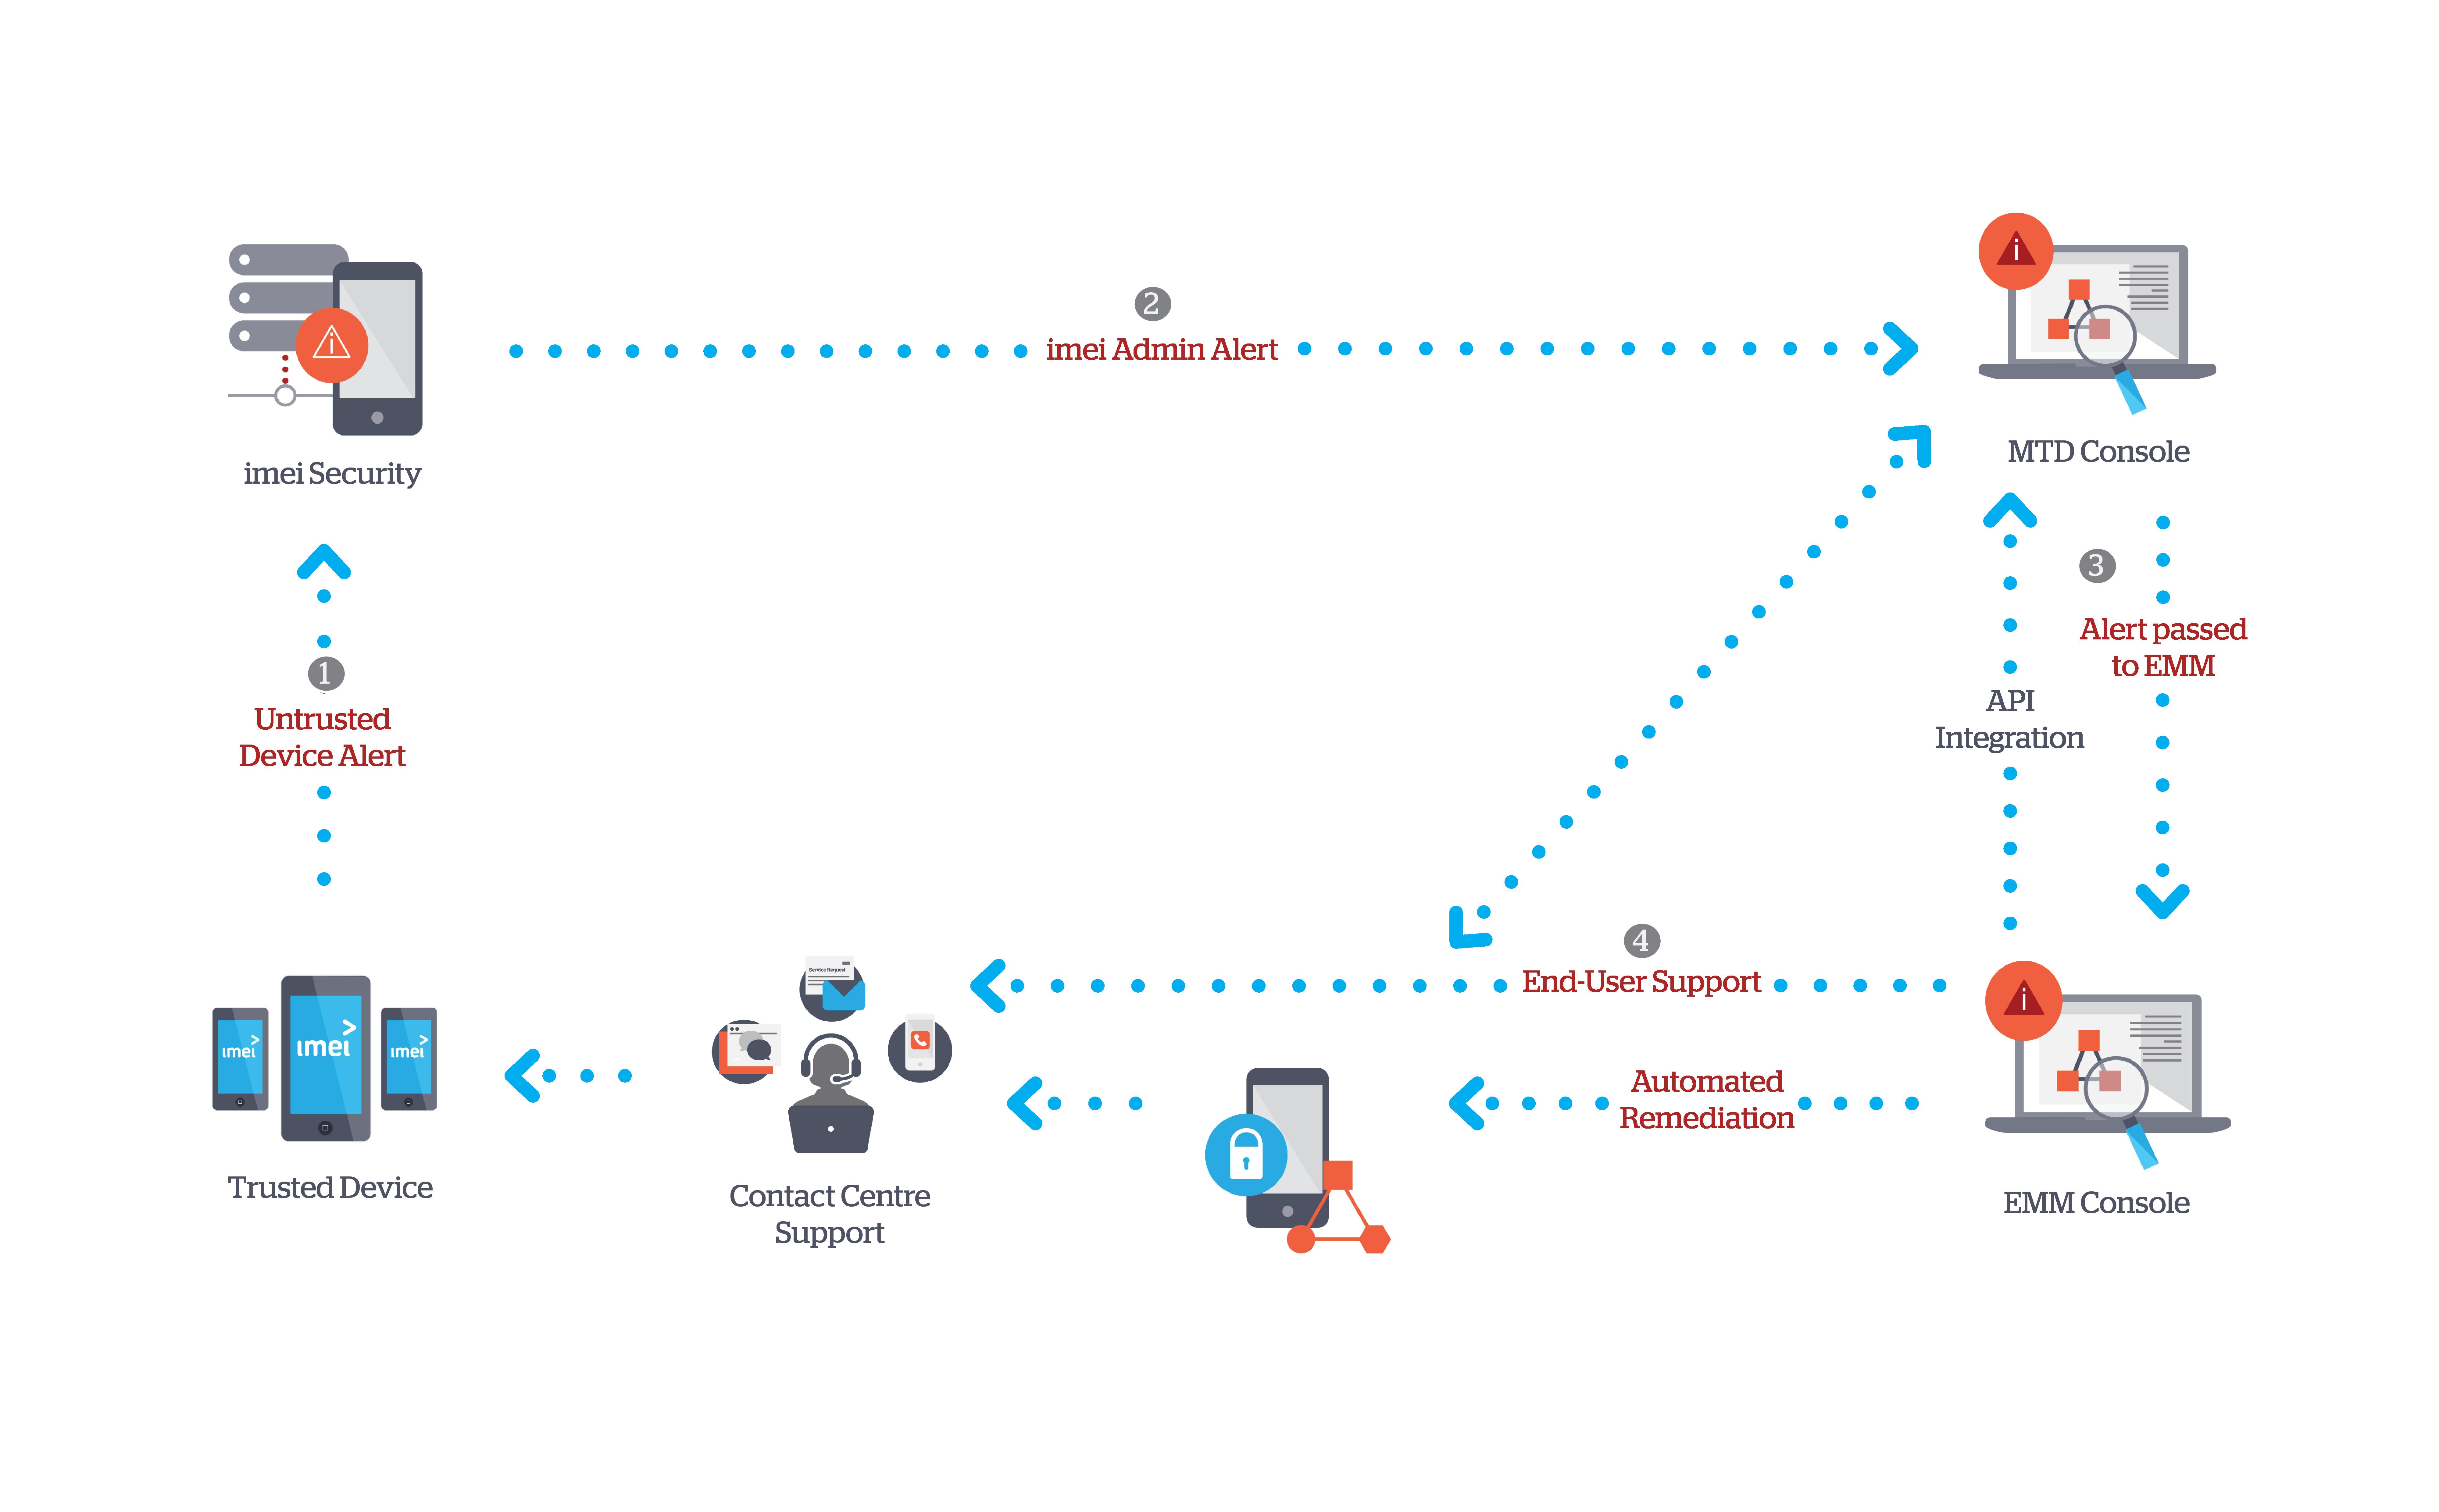 imei Secure diagram